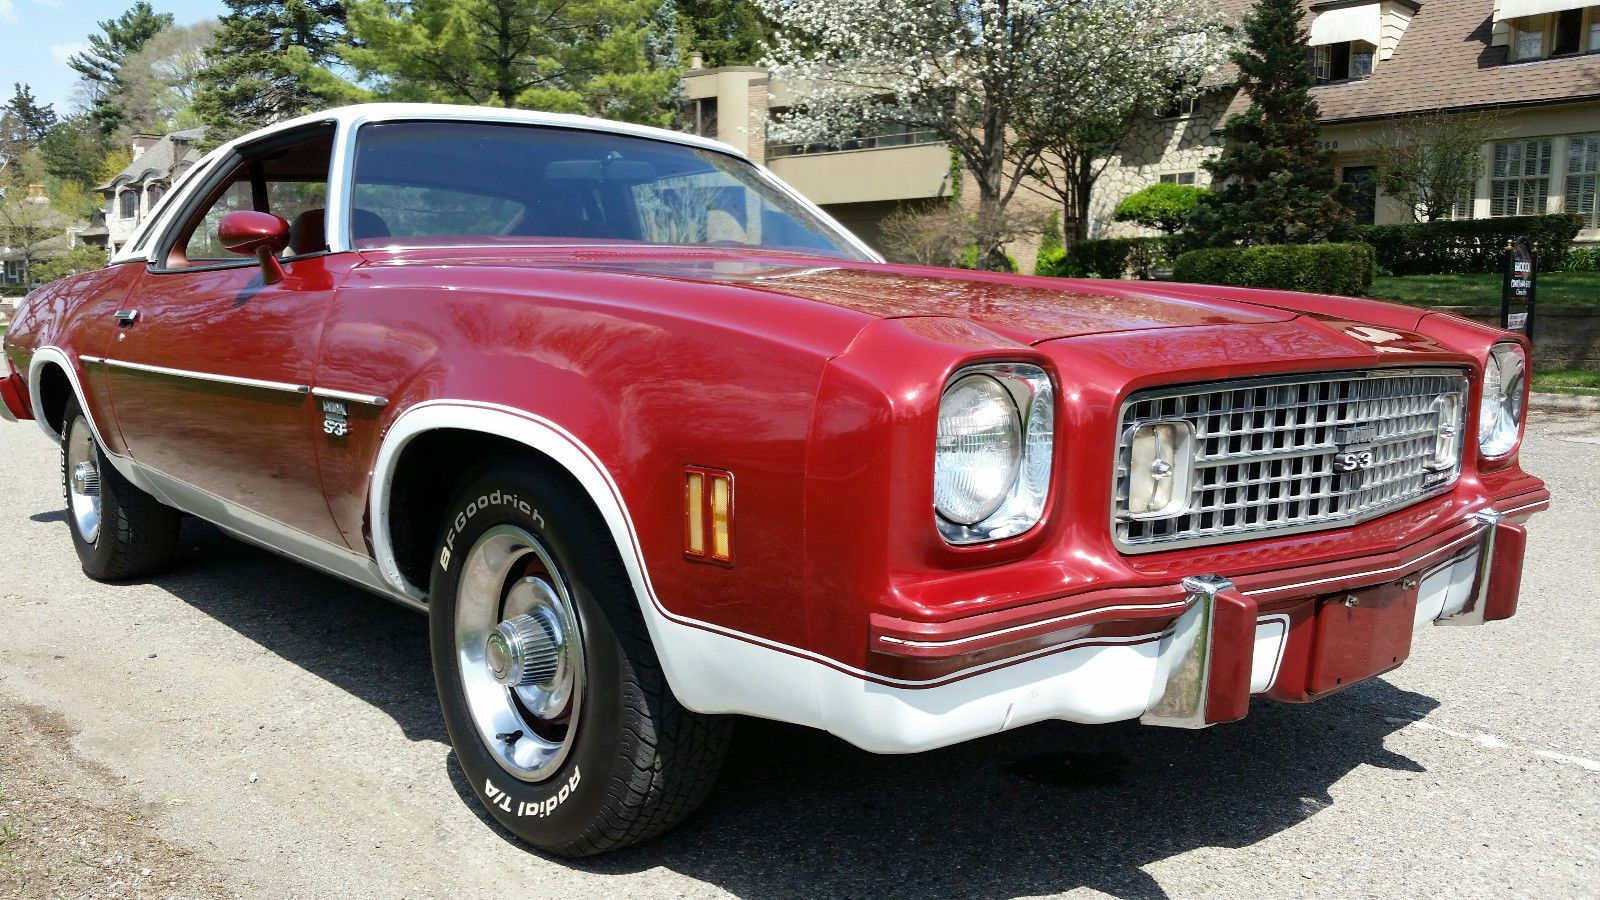 1974 Chevrolet Laguna S 3 Dream Cars Chevrolet Chevelle Chevrolet